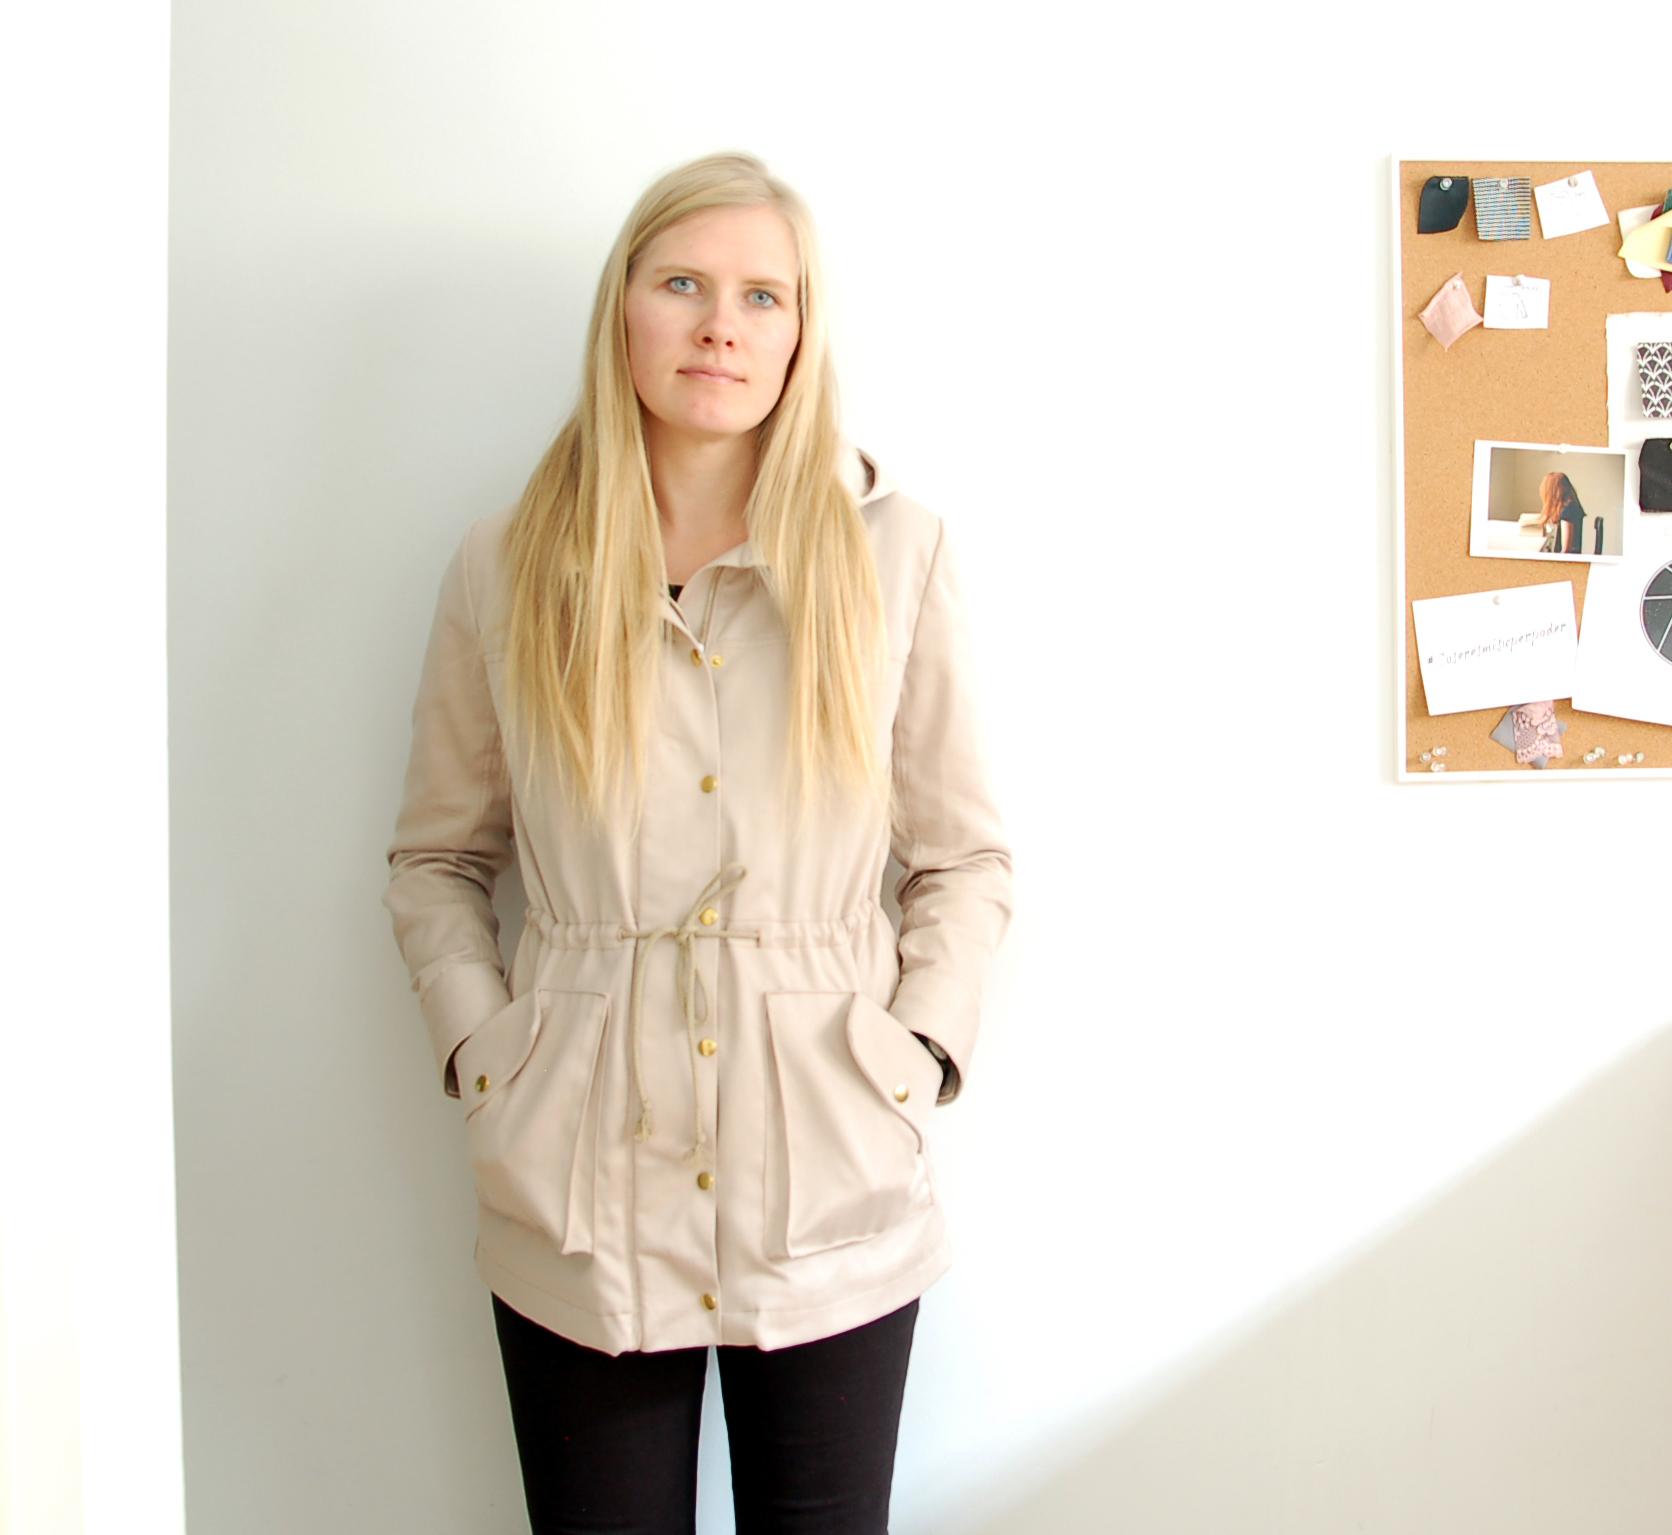 Kelly anorak www.studiocostura.com